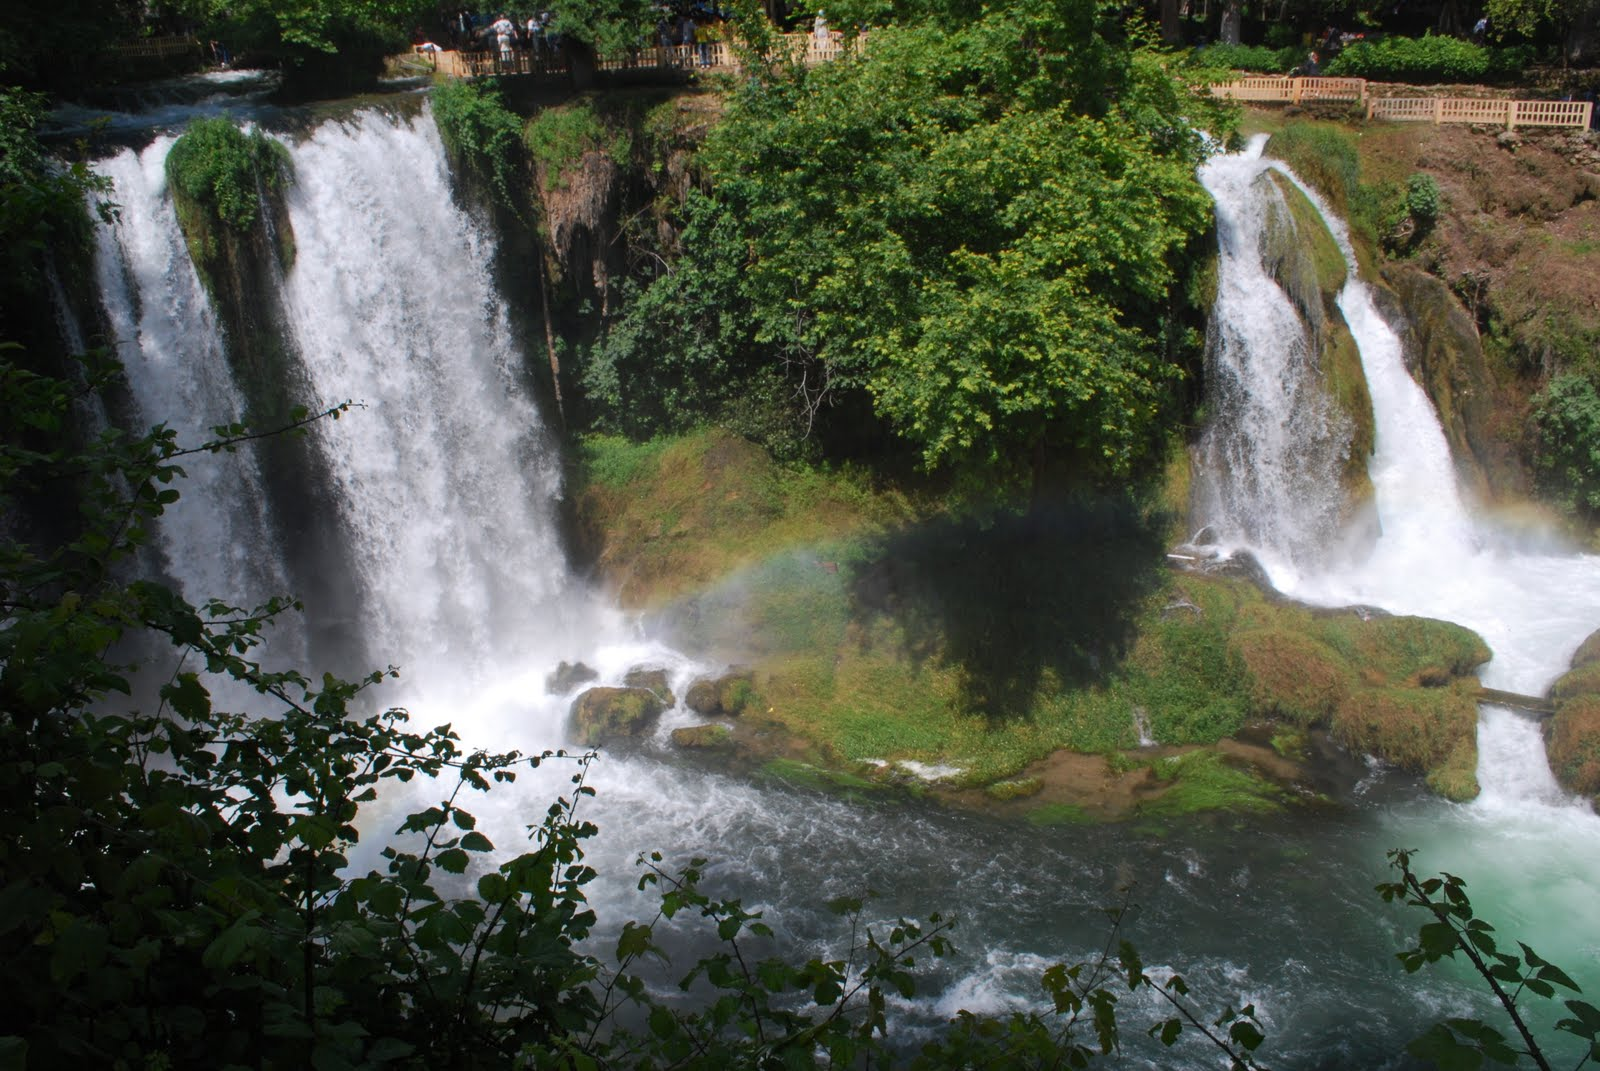 Sam Goldsmith: Antalya and The Loving Düden Waterfall.